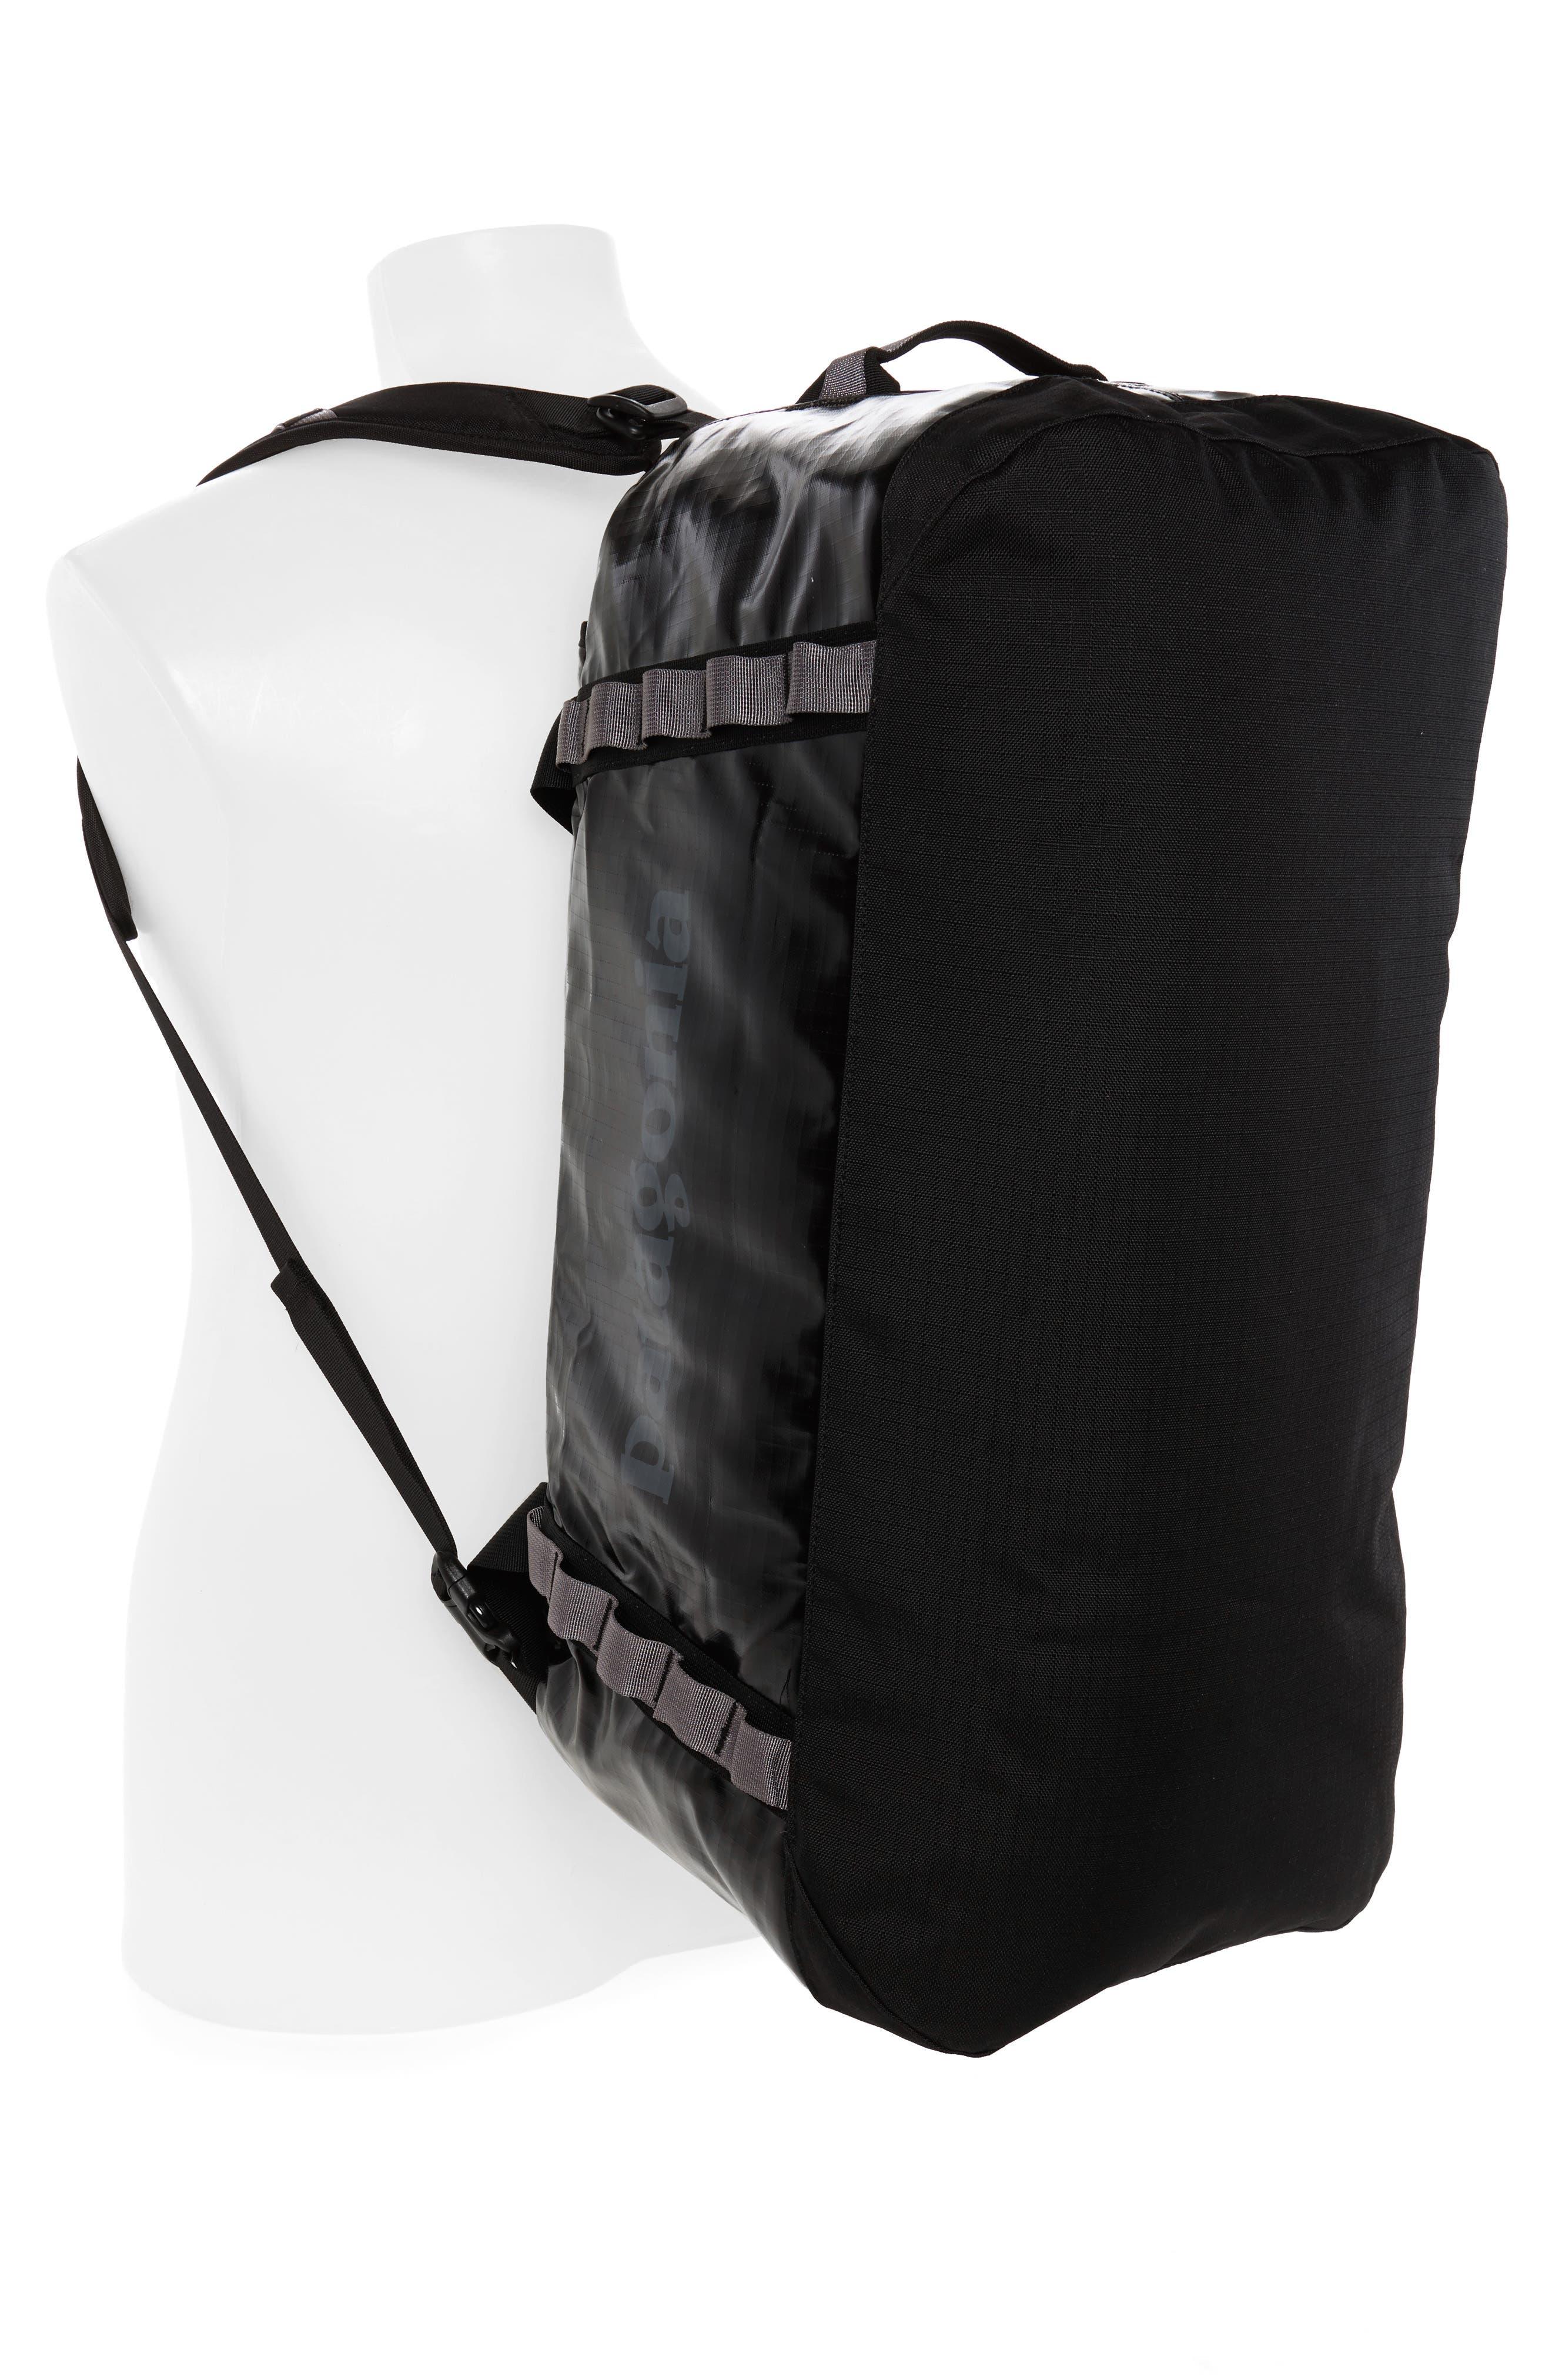 Black Hole Water Repellent Duffel Bag,                             Alternate thumbnail 2, color,                             Black